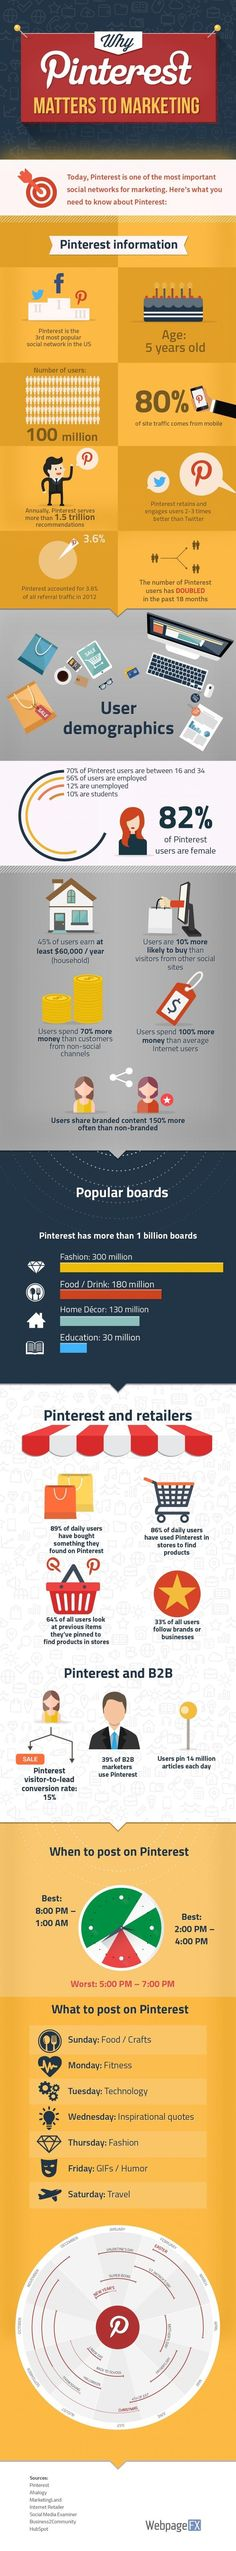 Why Pinterest Matters to Marketing Visit my blog http://configuroweb.blogspot.com